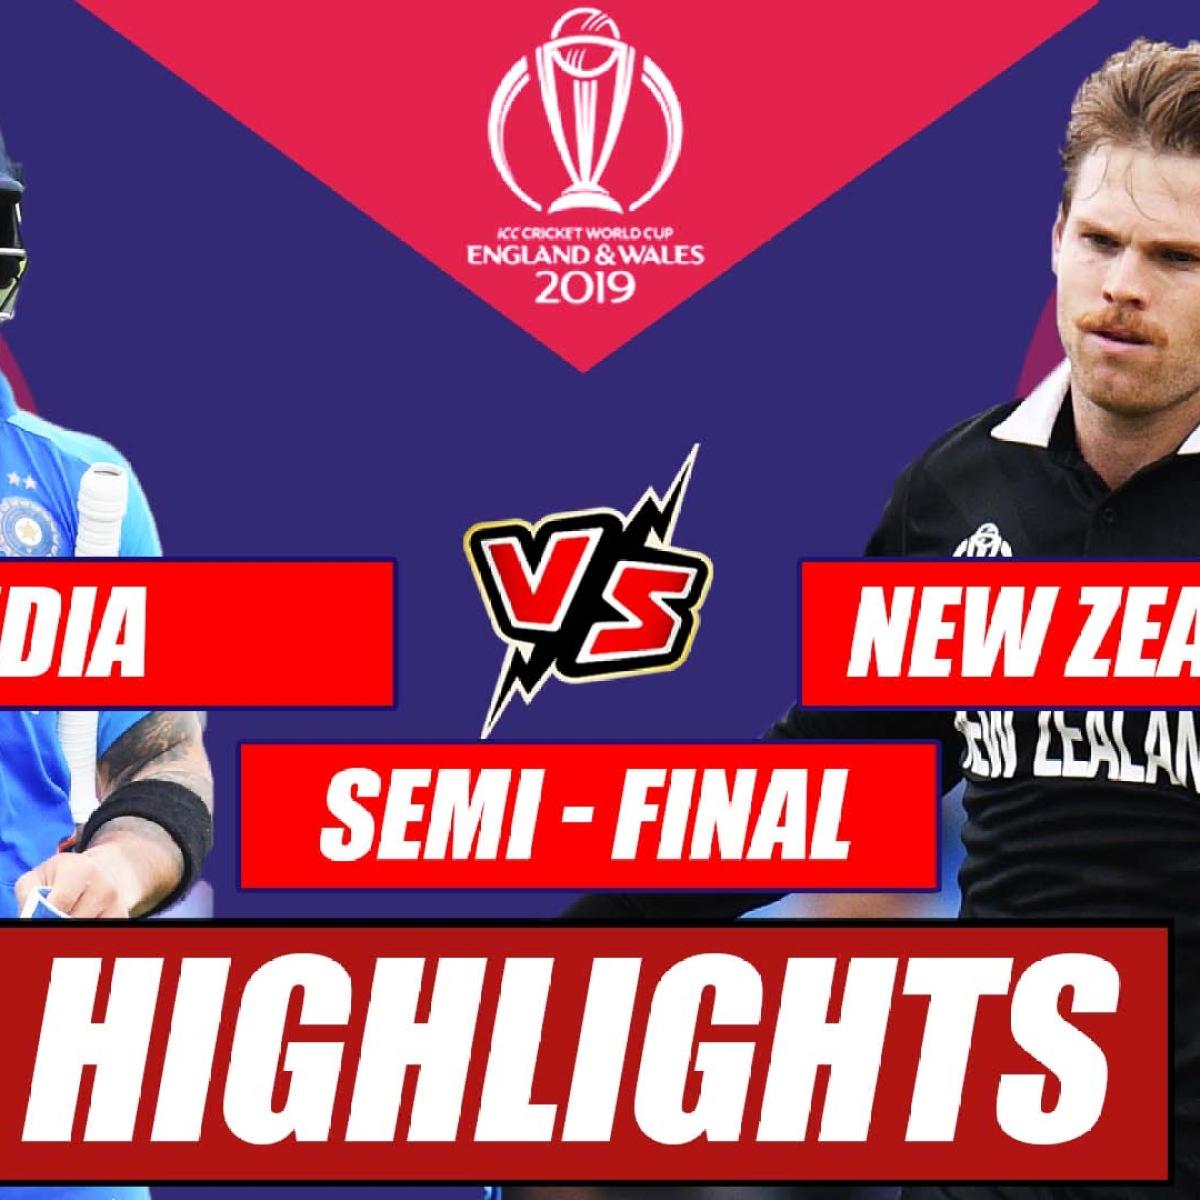 India vs New Zealand – Semi Final Match Highlights   Dark Horse New Zealand End India's Campaign